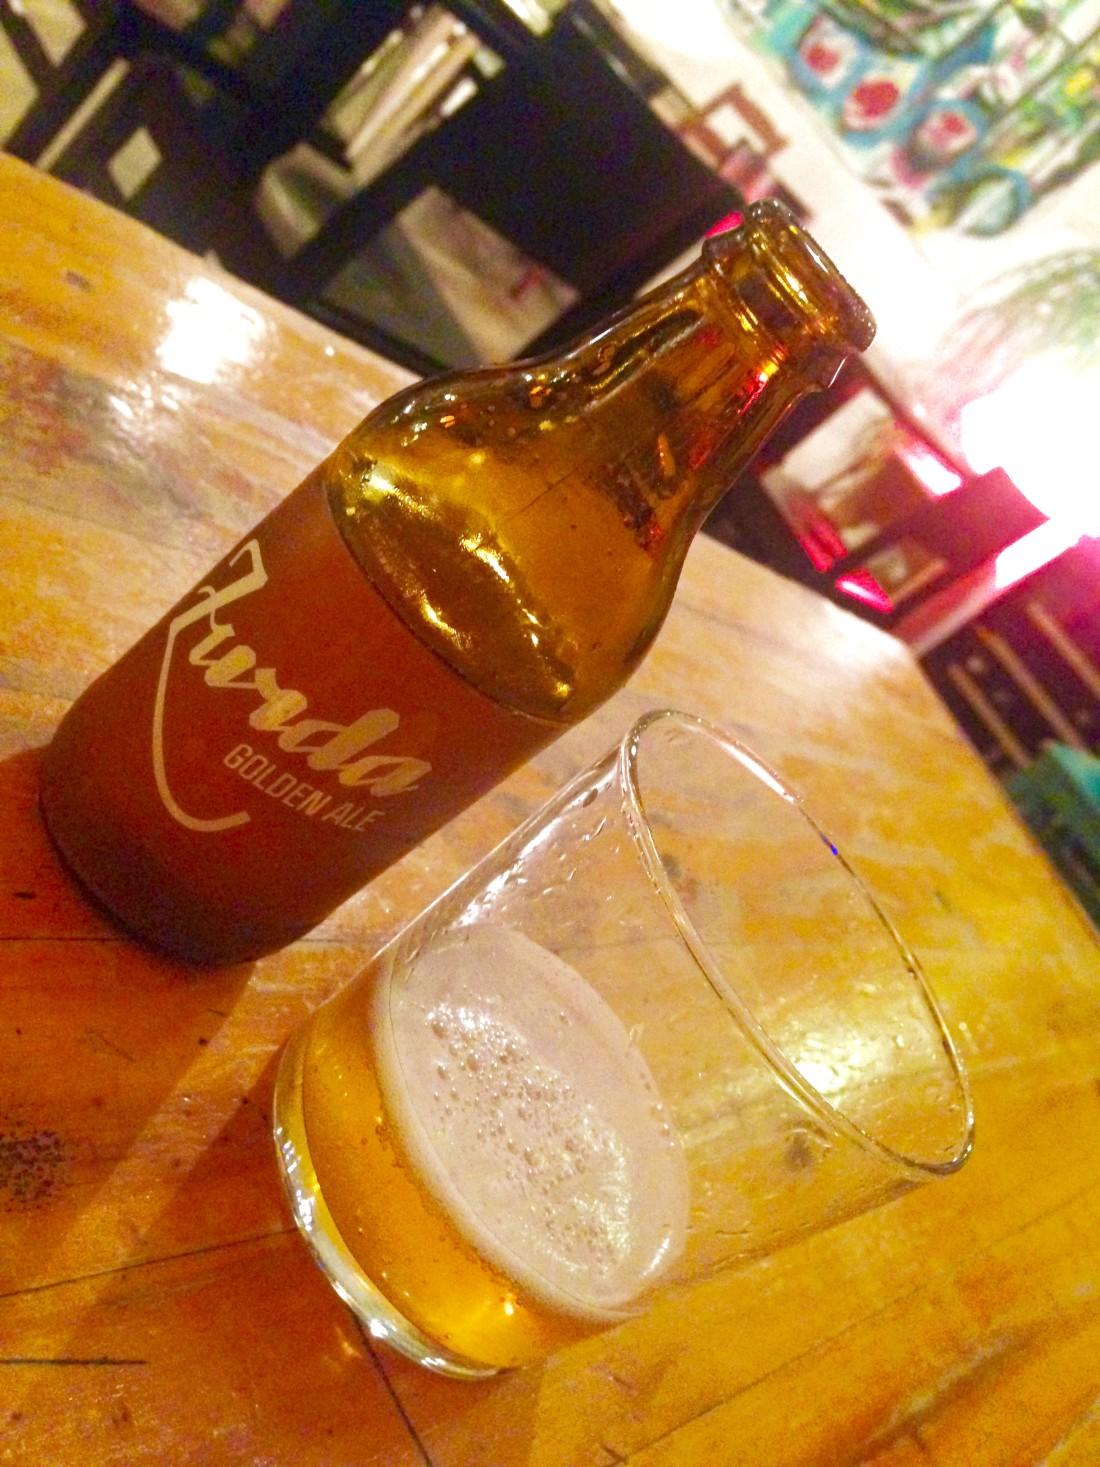 Craft Beer Find - Sevilla, Spain